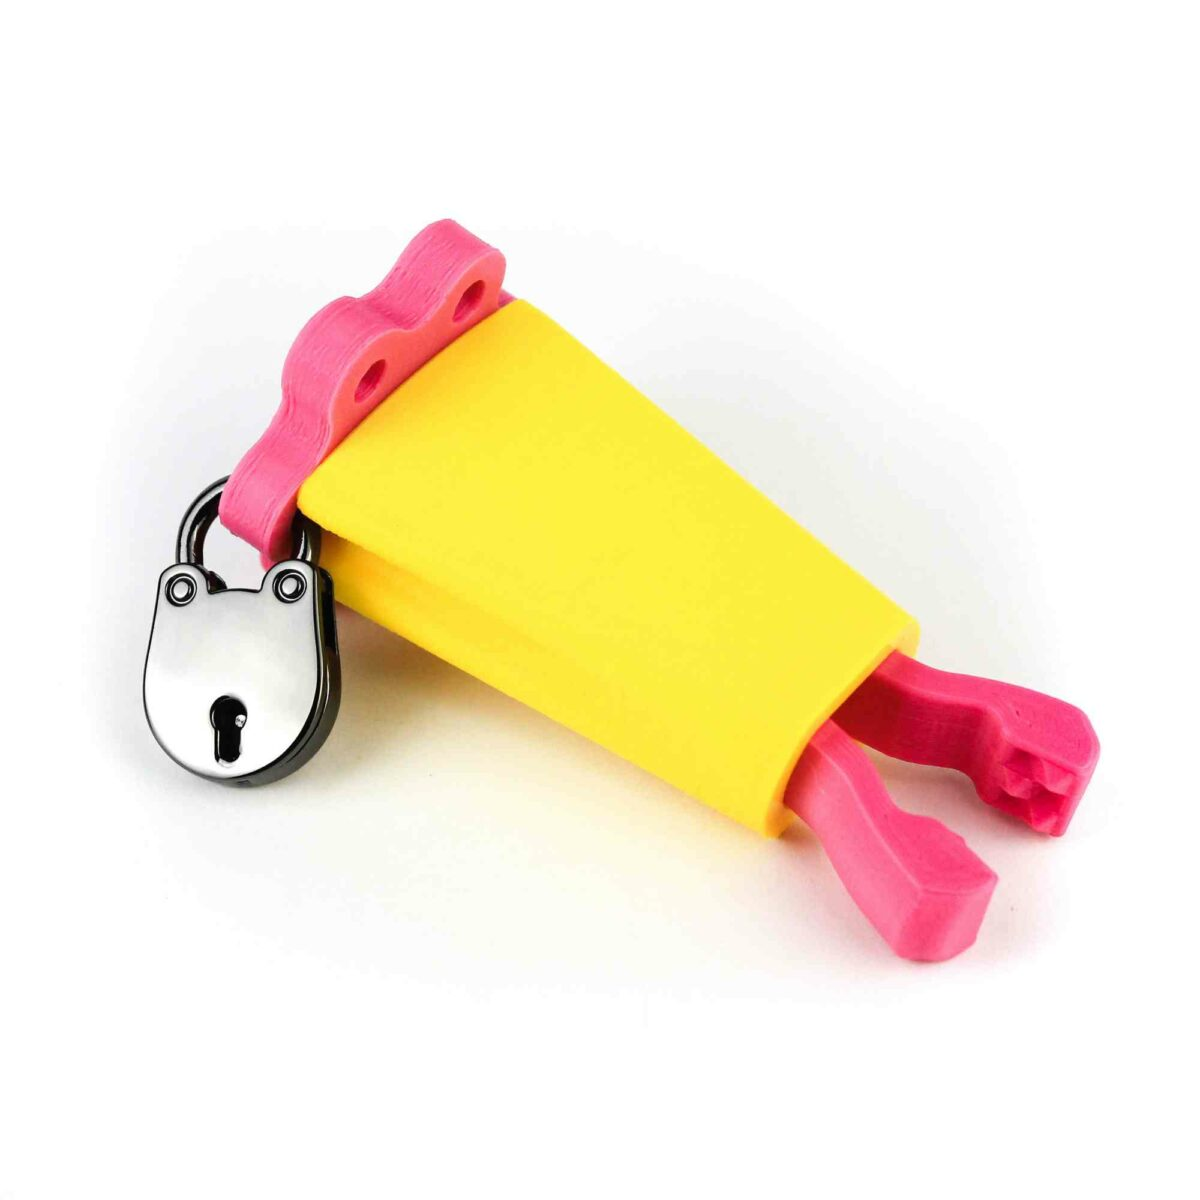 Lockable Nipple Clamps, Terrible Toyshop's signature heavy duty tweezer clamps